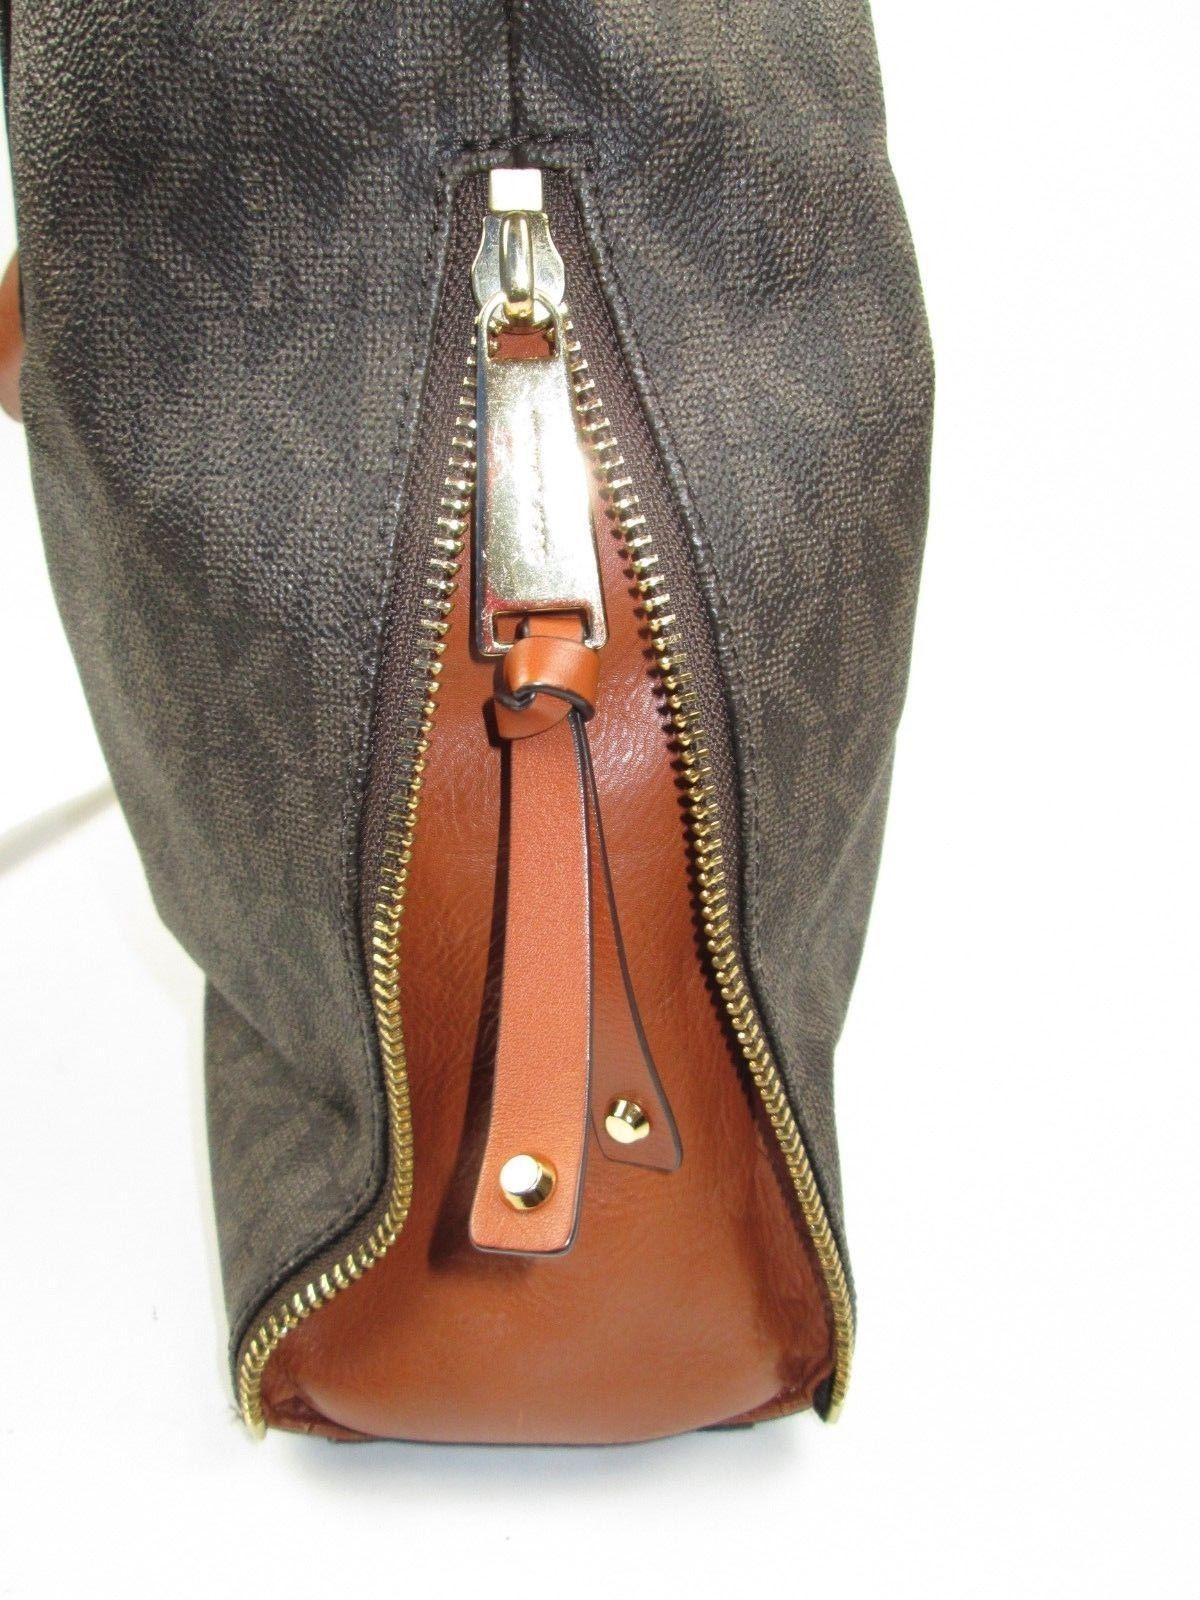 8168b28f7499 MICHAEL KORS Signature Devon Mocha Large Shoulder Tote Bag Purse Brown  Wonderful